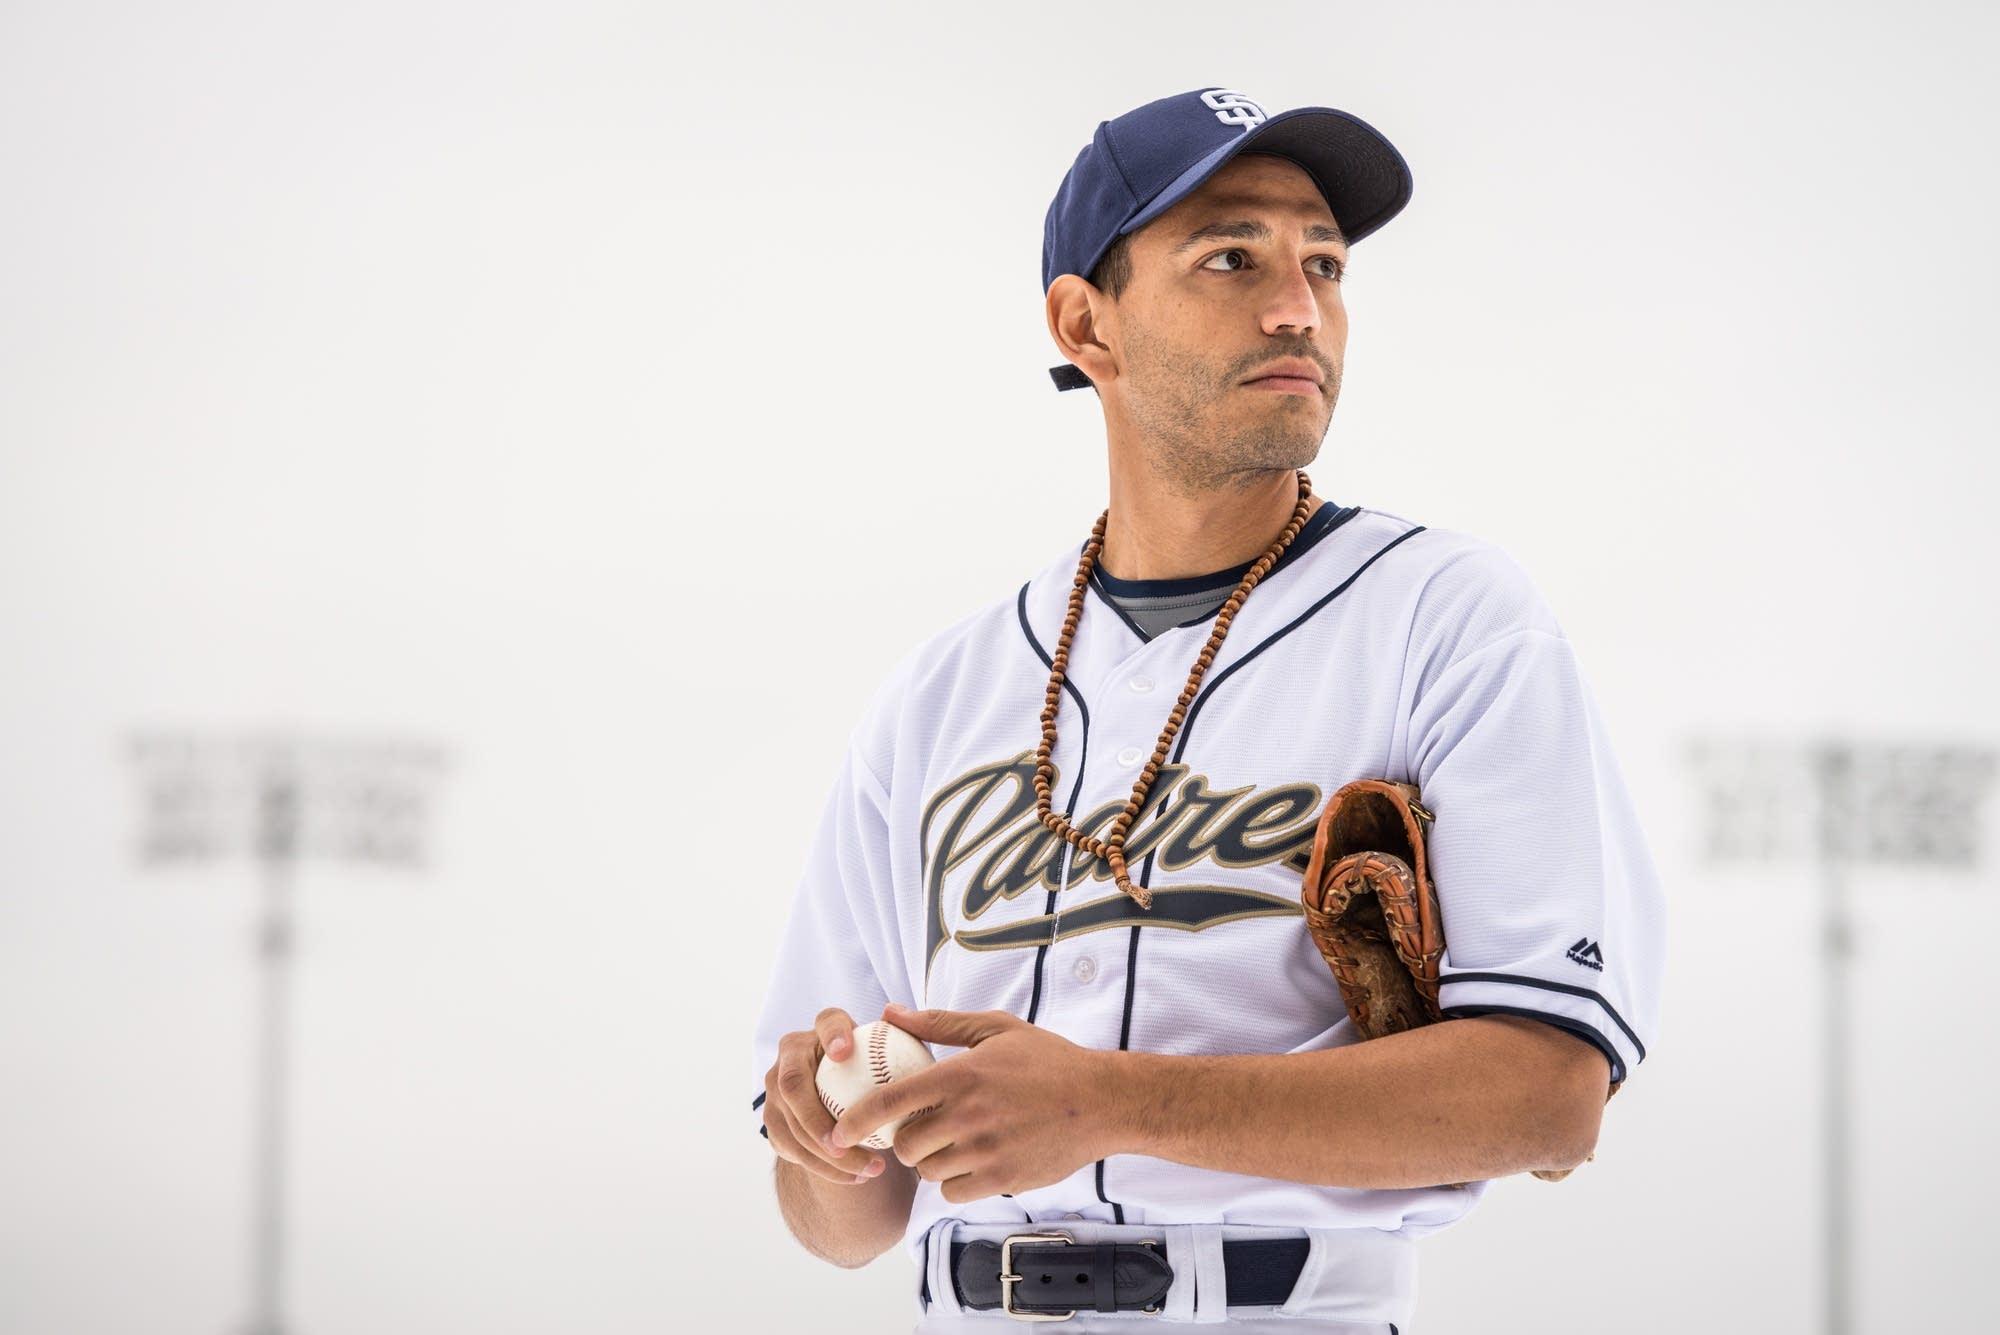 Christopher Rivas plays Victor Castillo, a Dominican pitcher